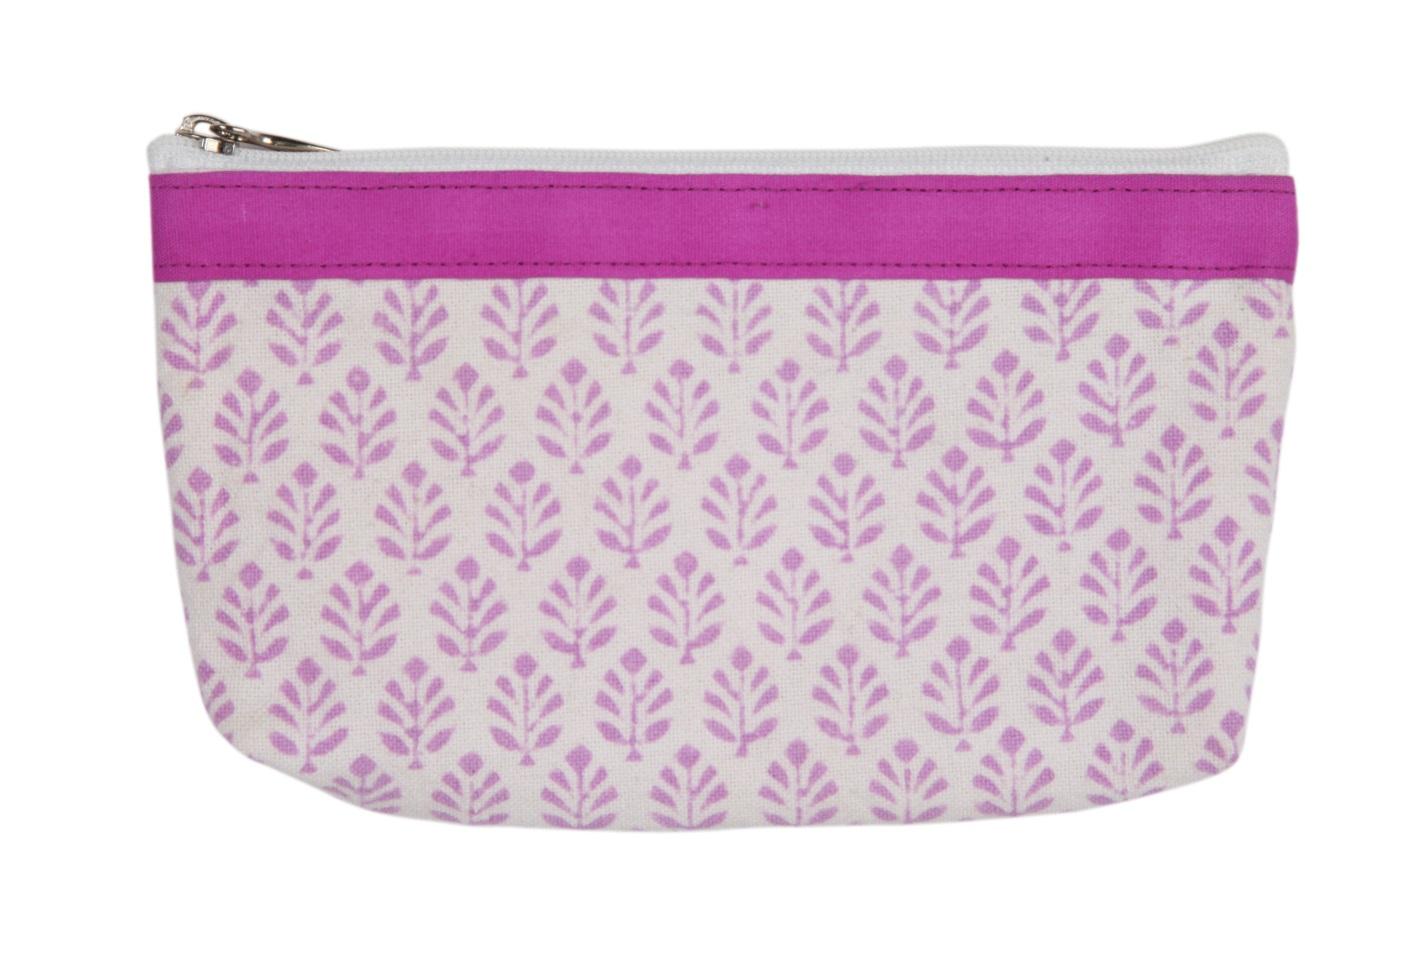 Knit Pro Tasche Reverie 12051